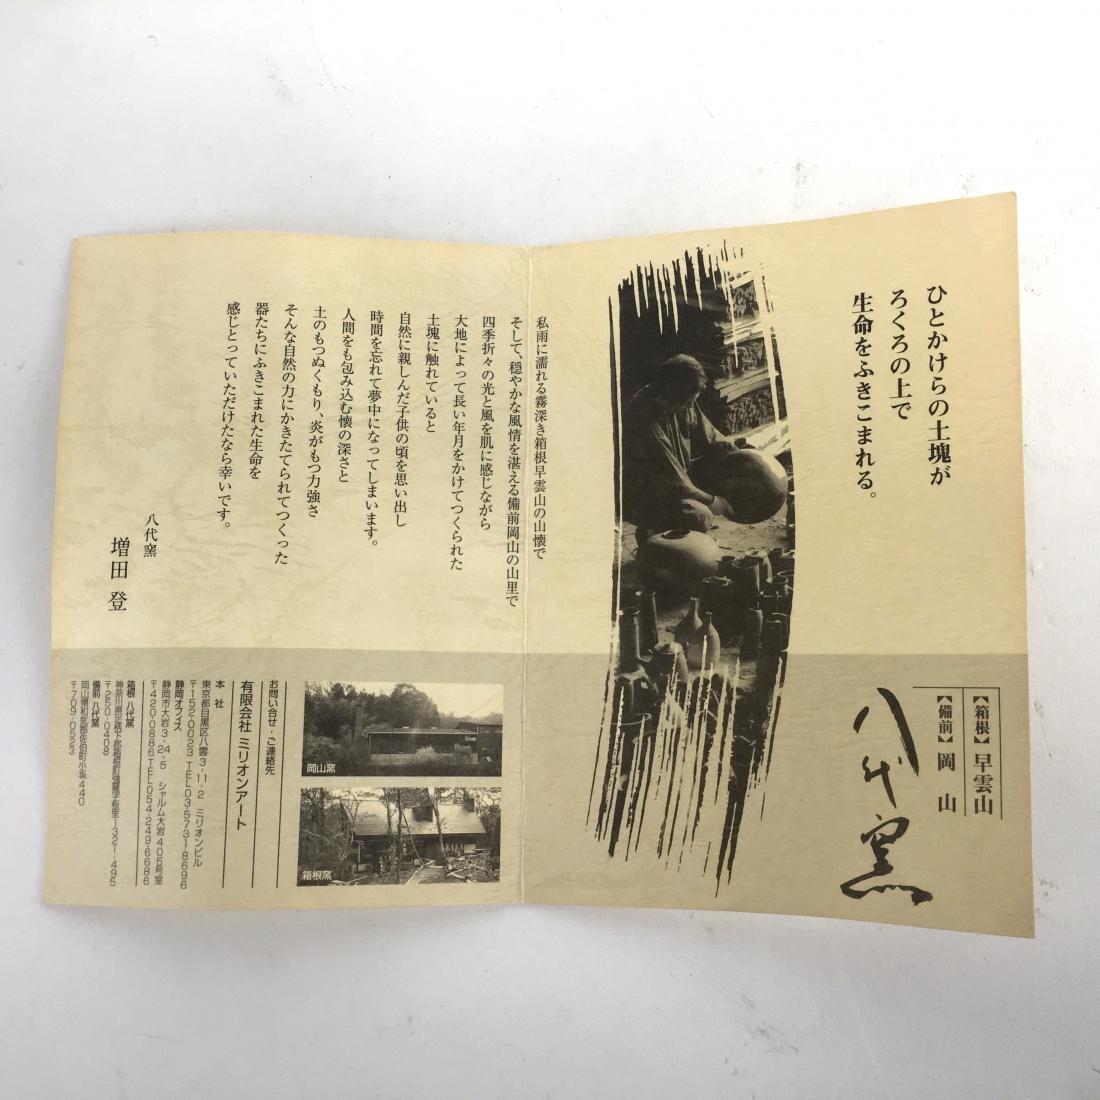 Karuizawa 1971 Yashiro 37 Year Old